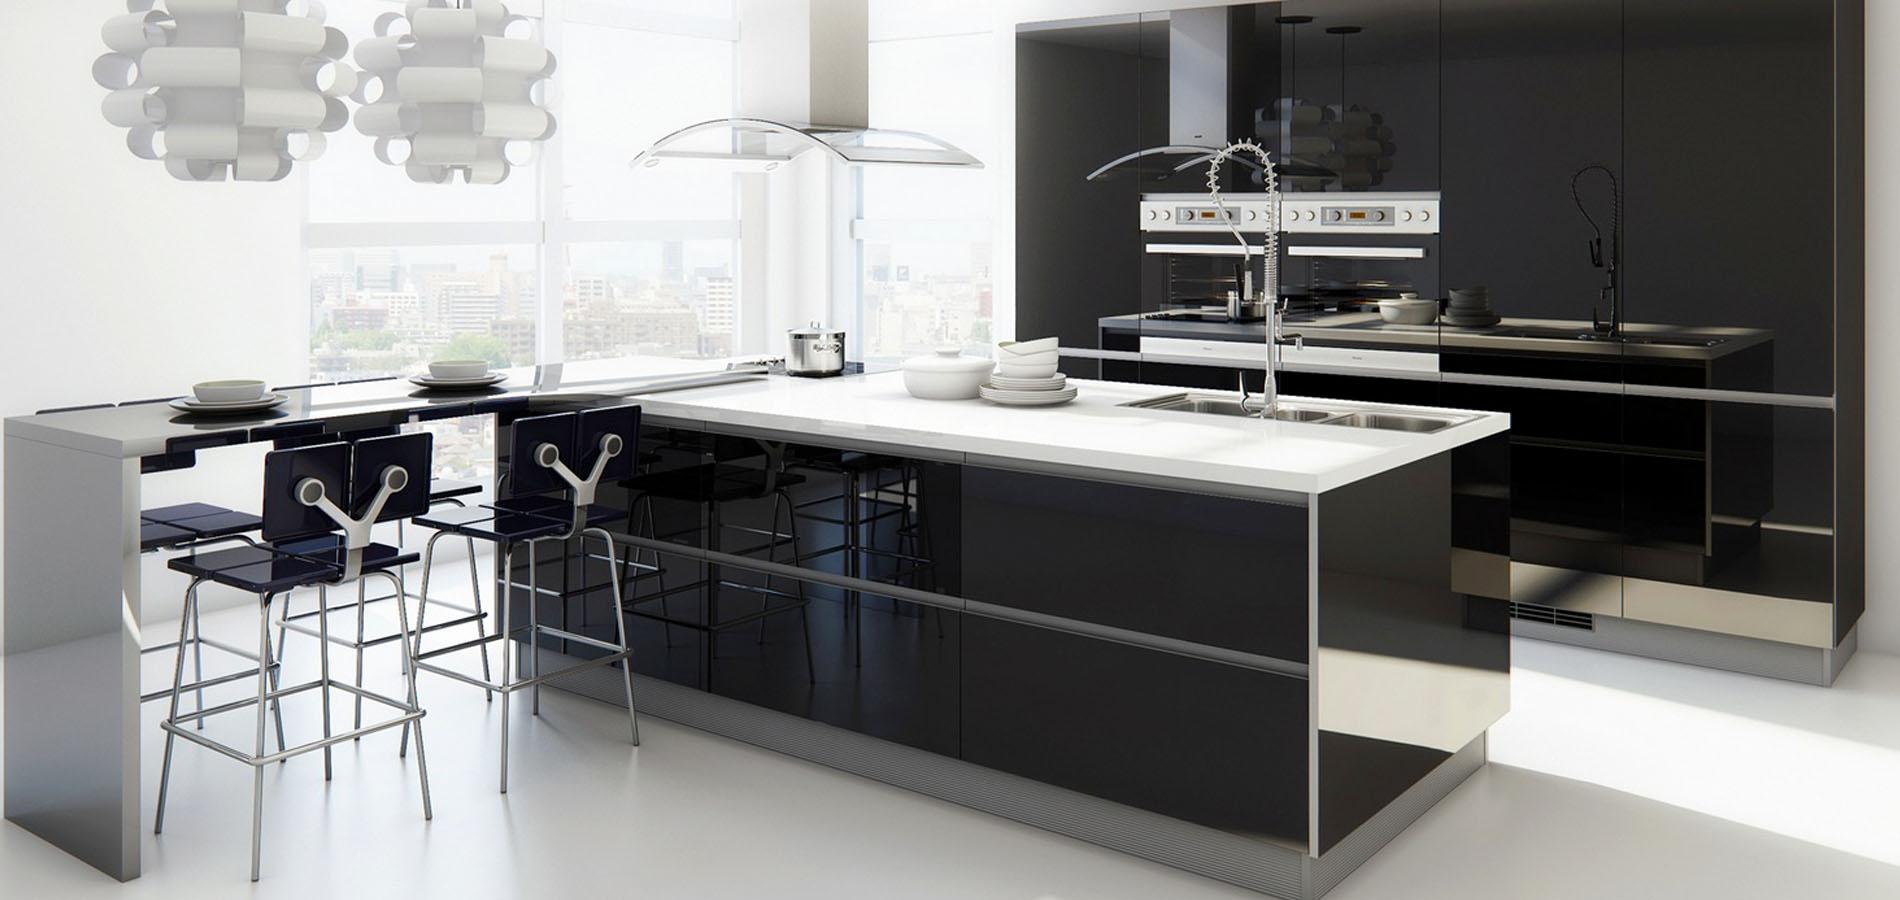 Uncategorized Advanced Kitchen Design advanced kitchen solutions ltd development copyrights adtl all rights reserved developed by senseforweb limited